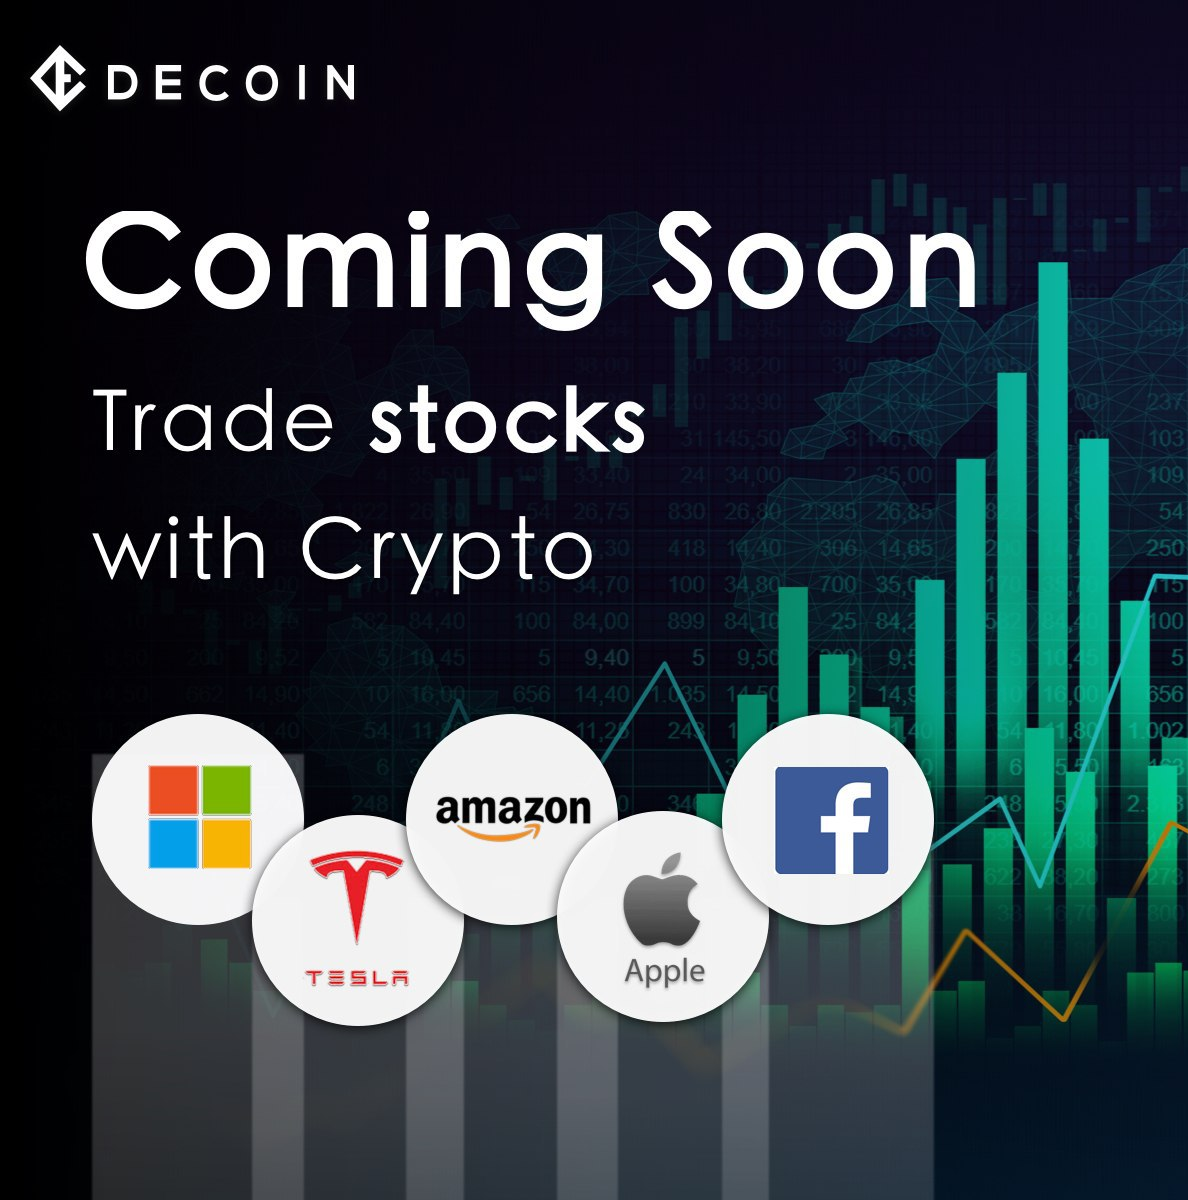 「DECOIN」独自通貨DTEPが好調!まもなく暗号通貨で株式売買提供も開始